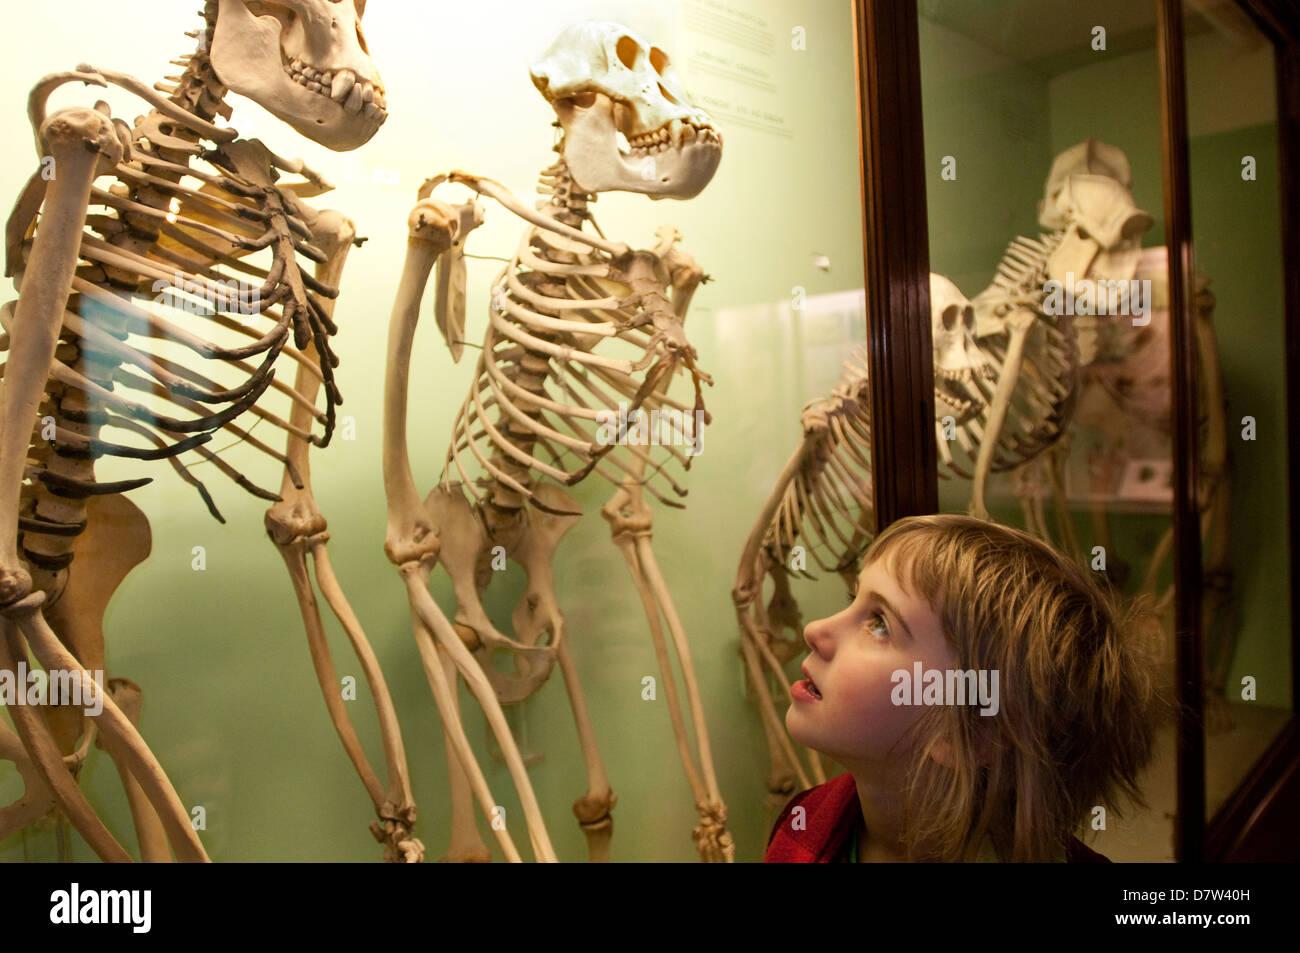 Girl looking at skeletons, Horniman Museum, London, England, UK - Stock Image